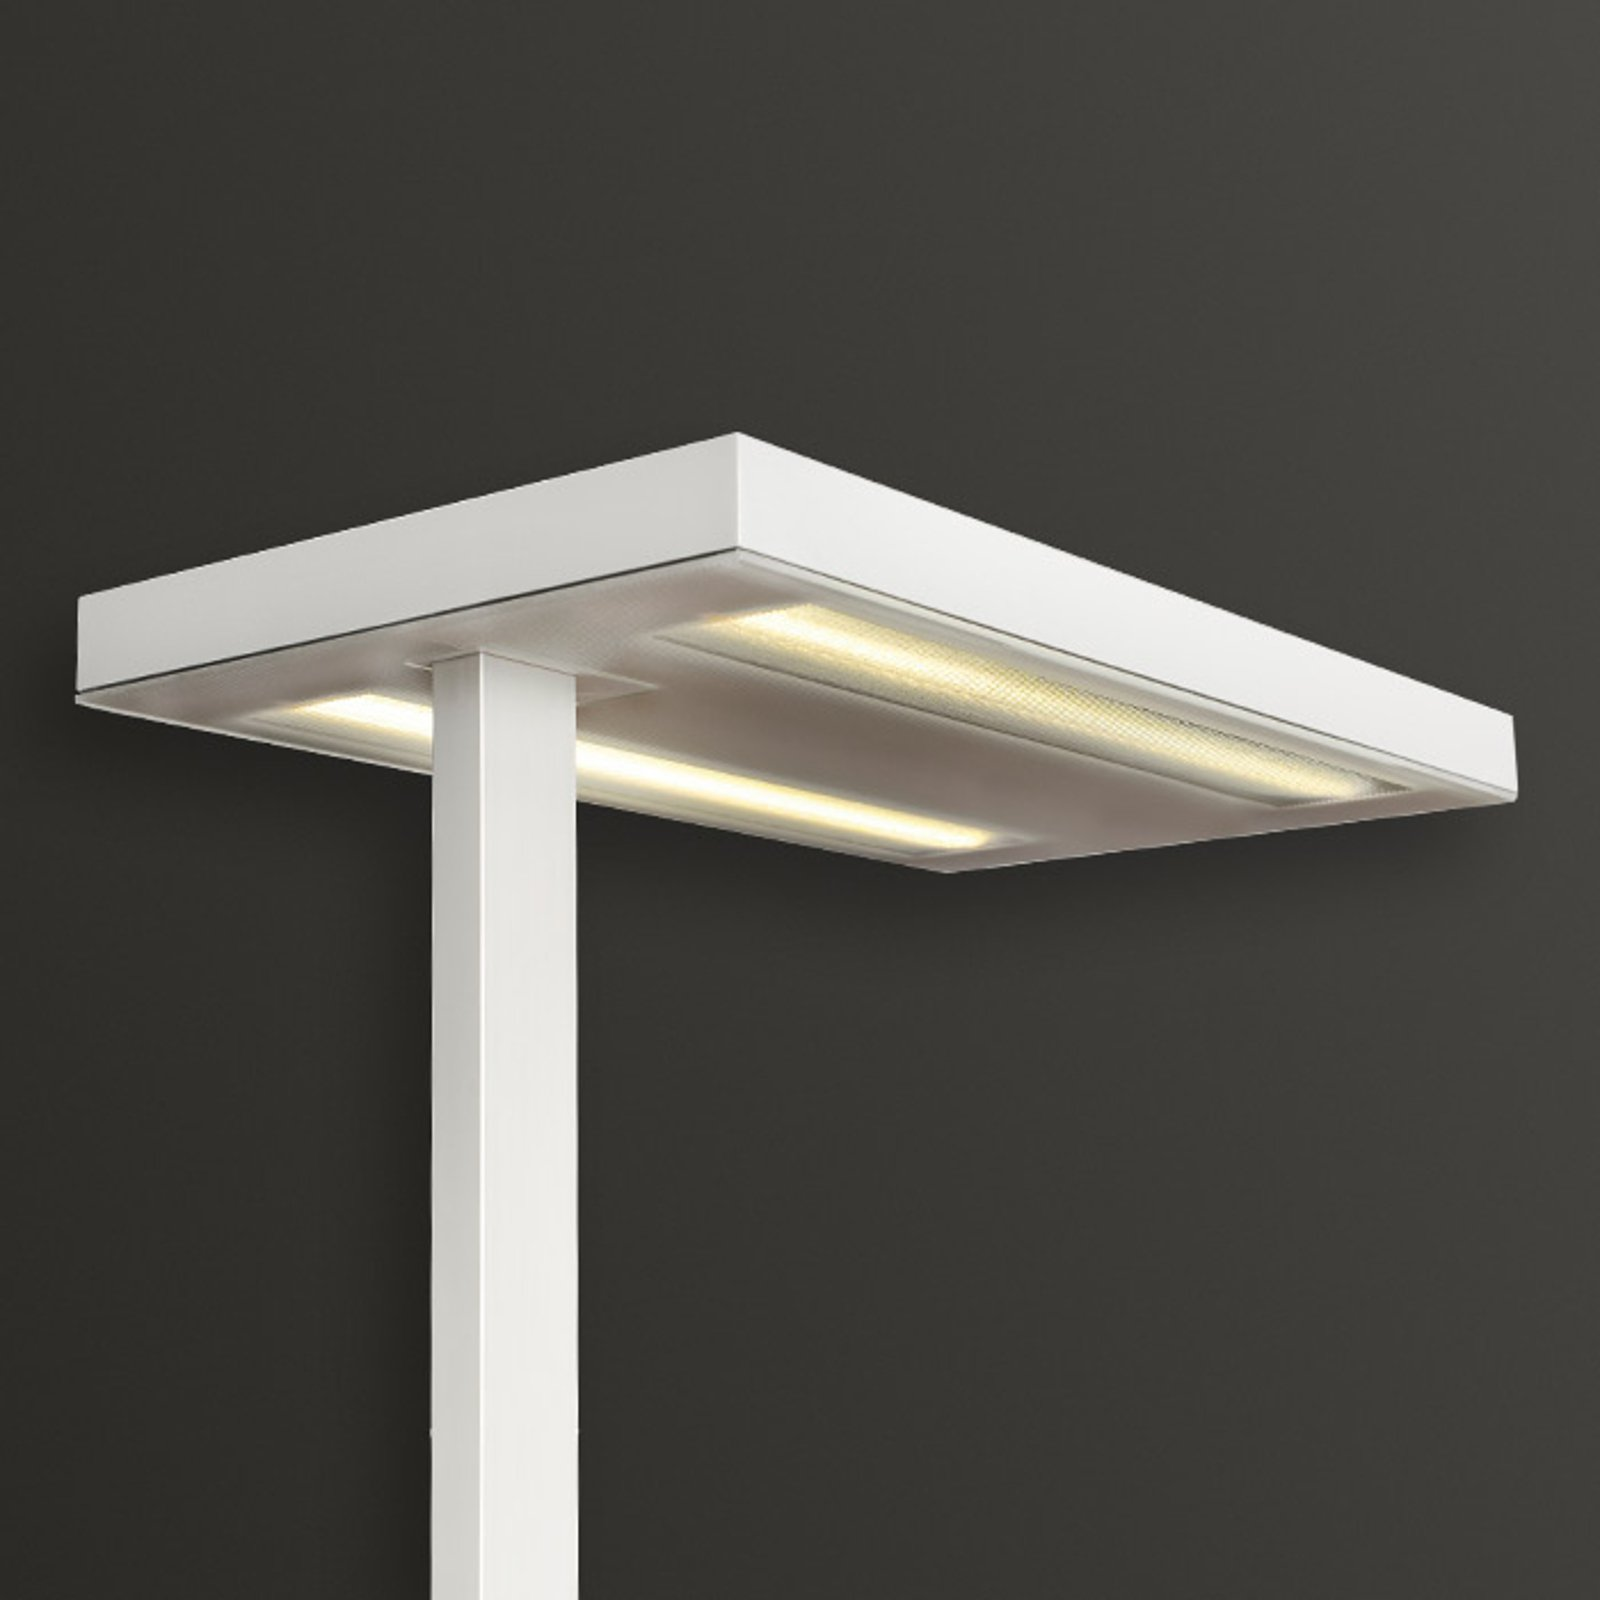 Gulvlampe Free-F LED10000 HFDd 840 SD hvit